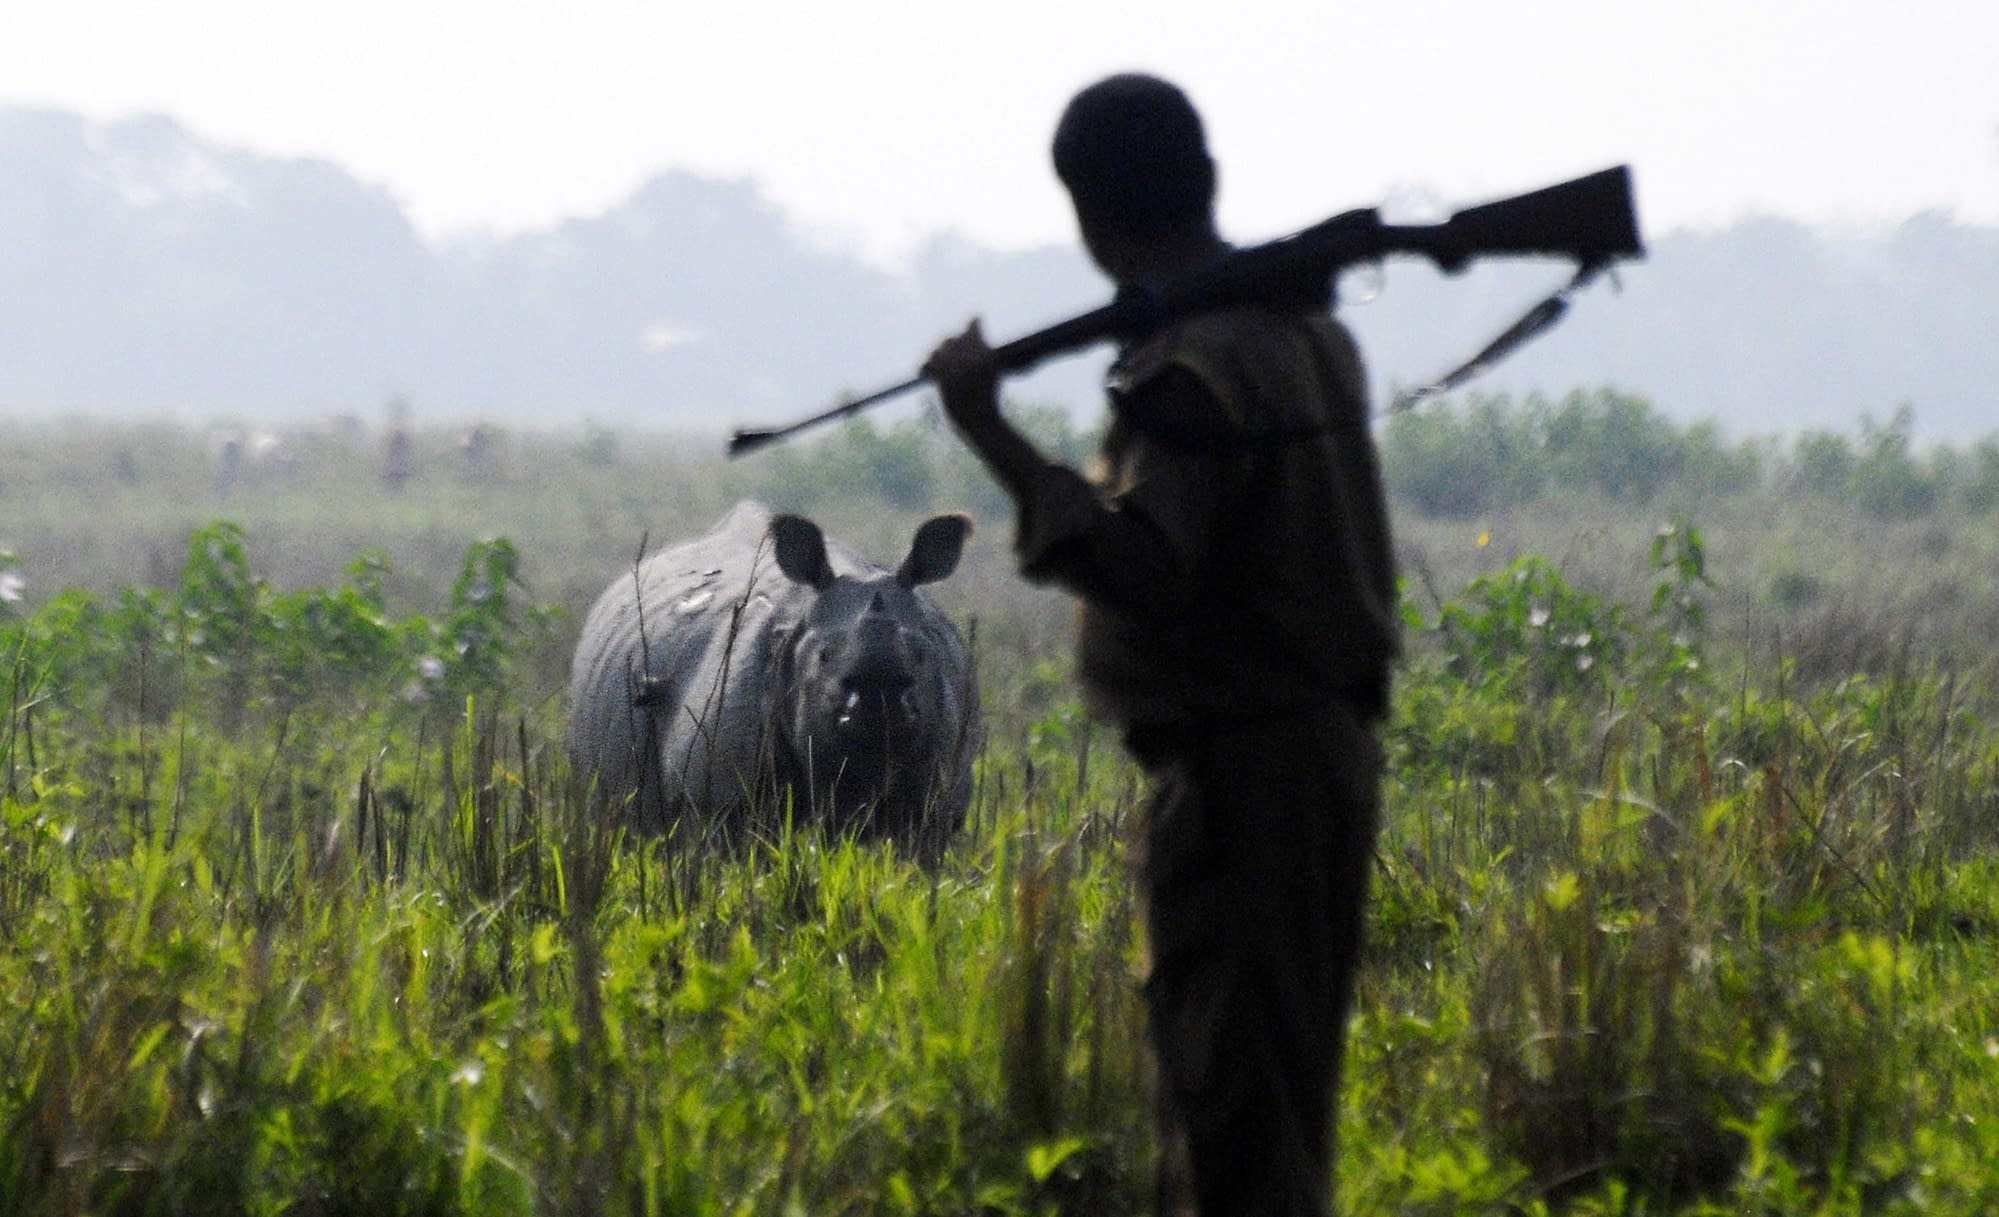 Gunshot Detection Technology has Deployed to Save Endangered Species